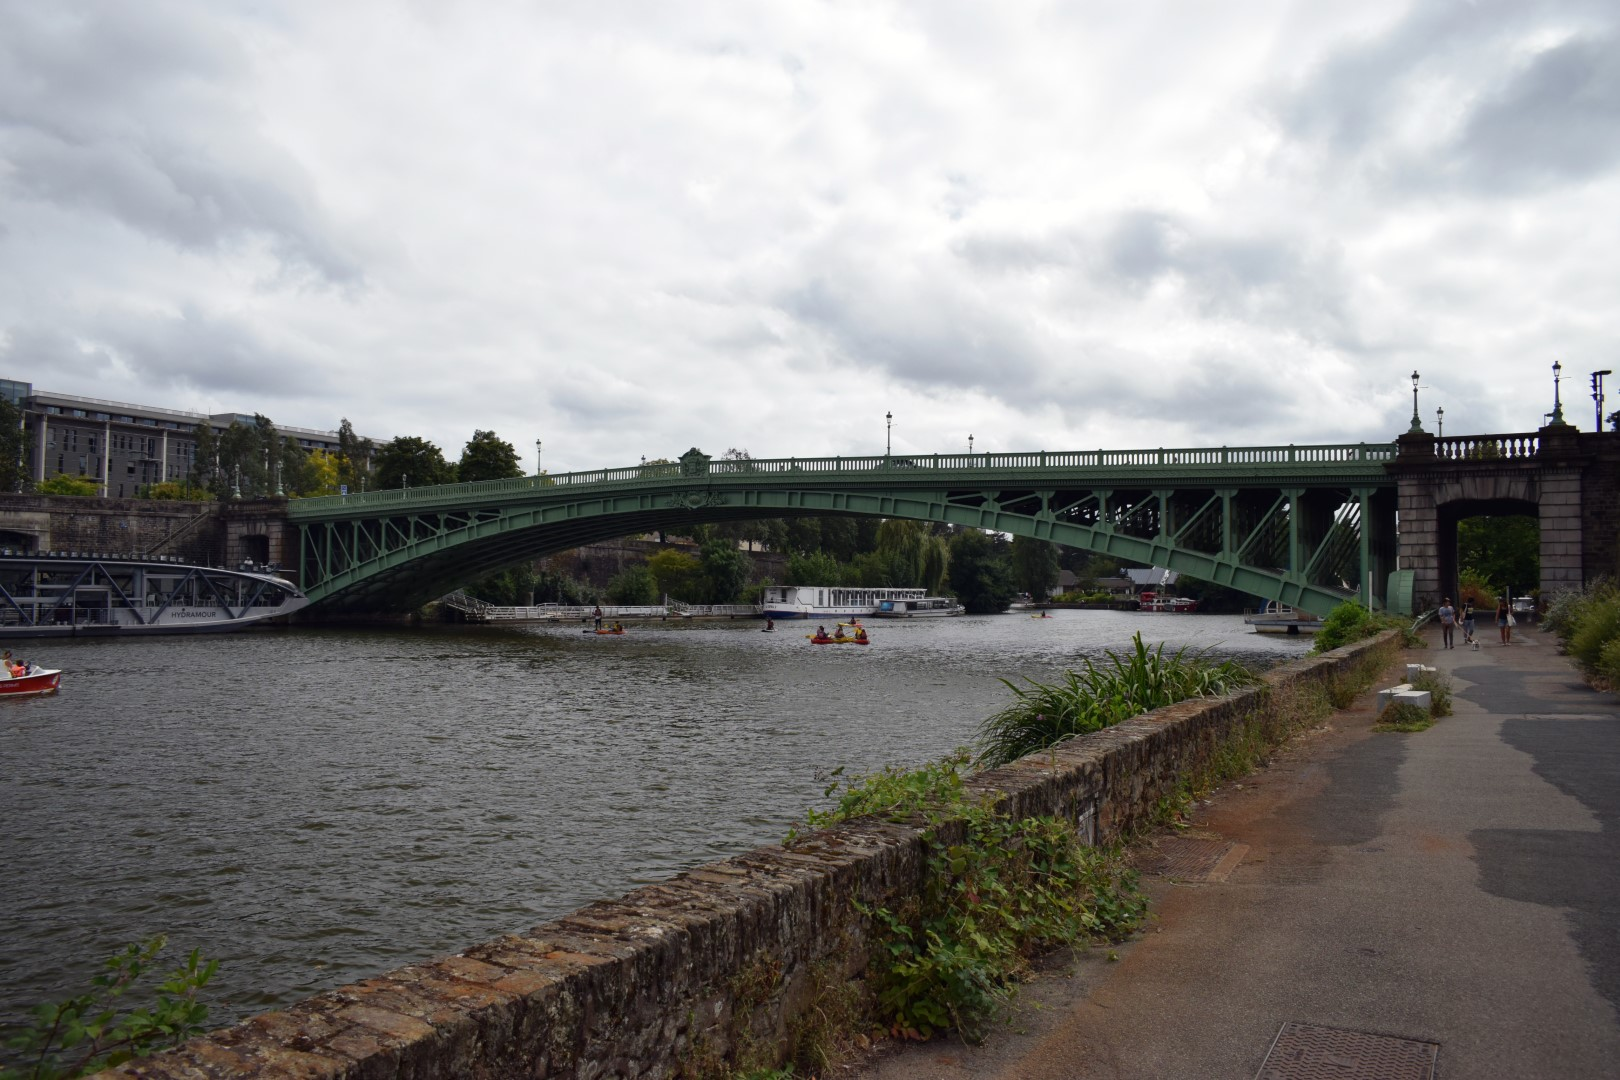 Along the Erdre River, Nantes, July 2020